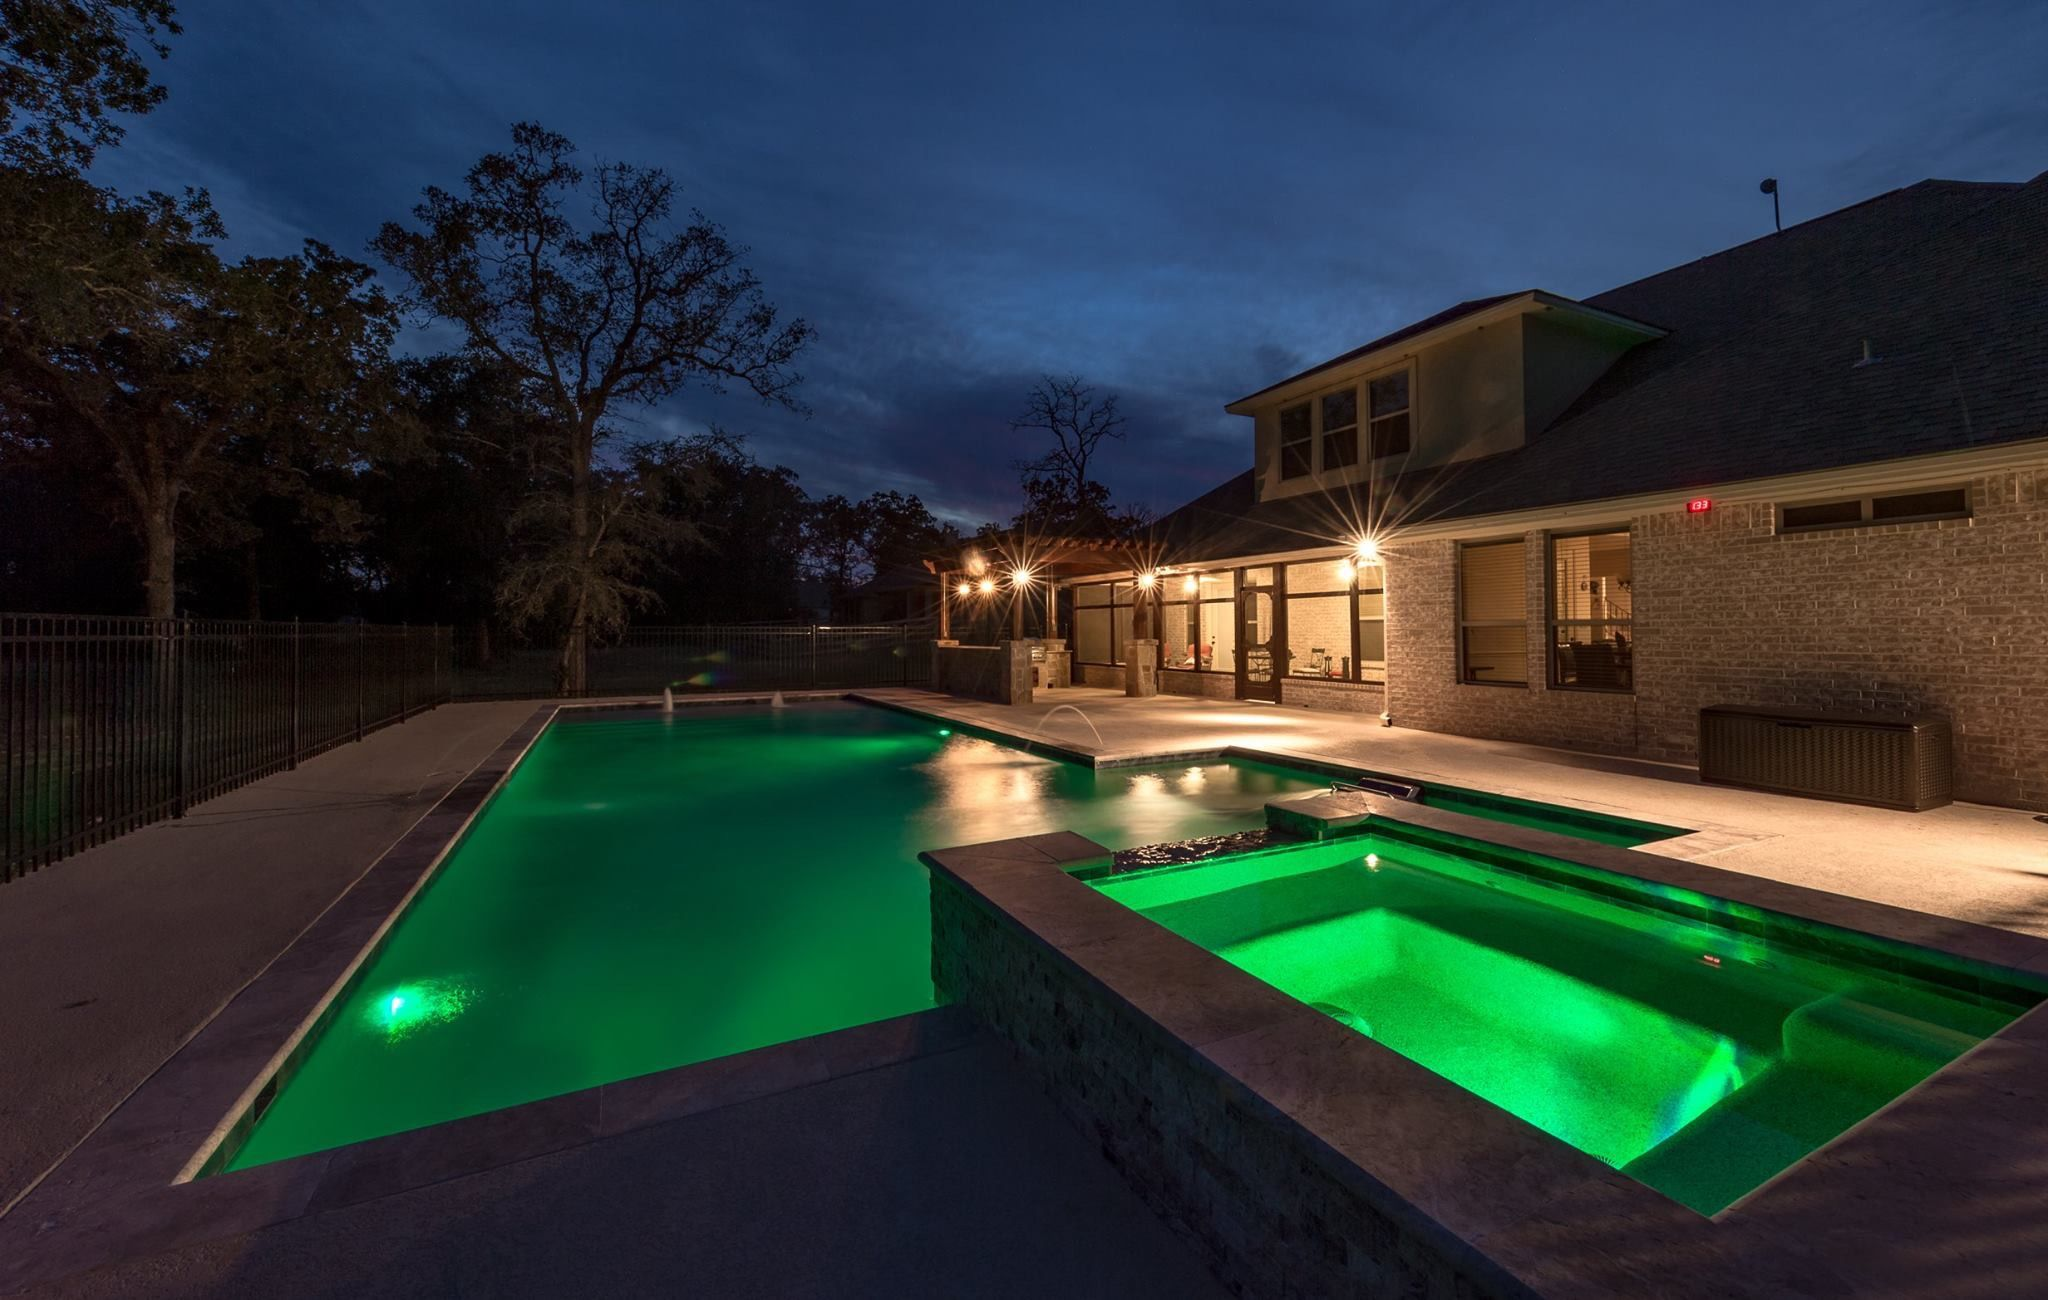 Fall Modern Design Spa Endlesspool Hayward Pebbletech Cremedementhe Poolequipment Omnilogic Lights Makingmemo Endless Pool Pool Lights Pool Designs